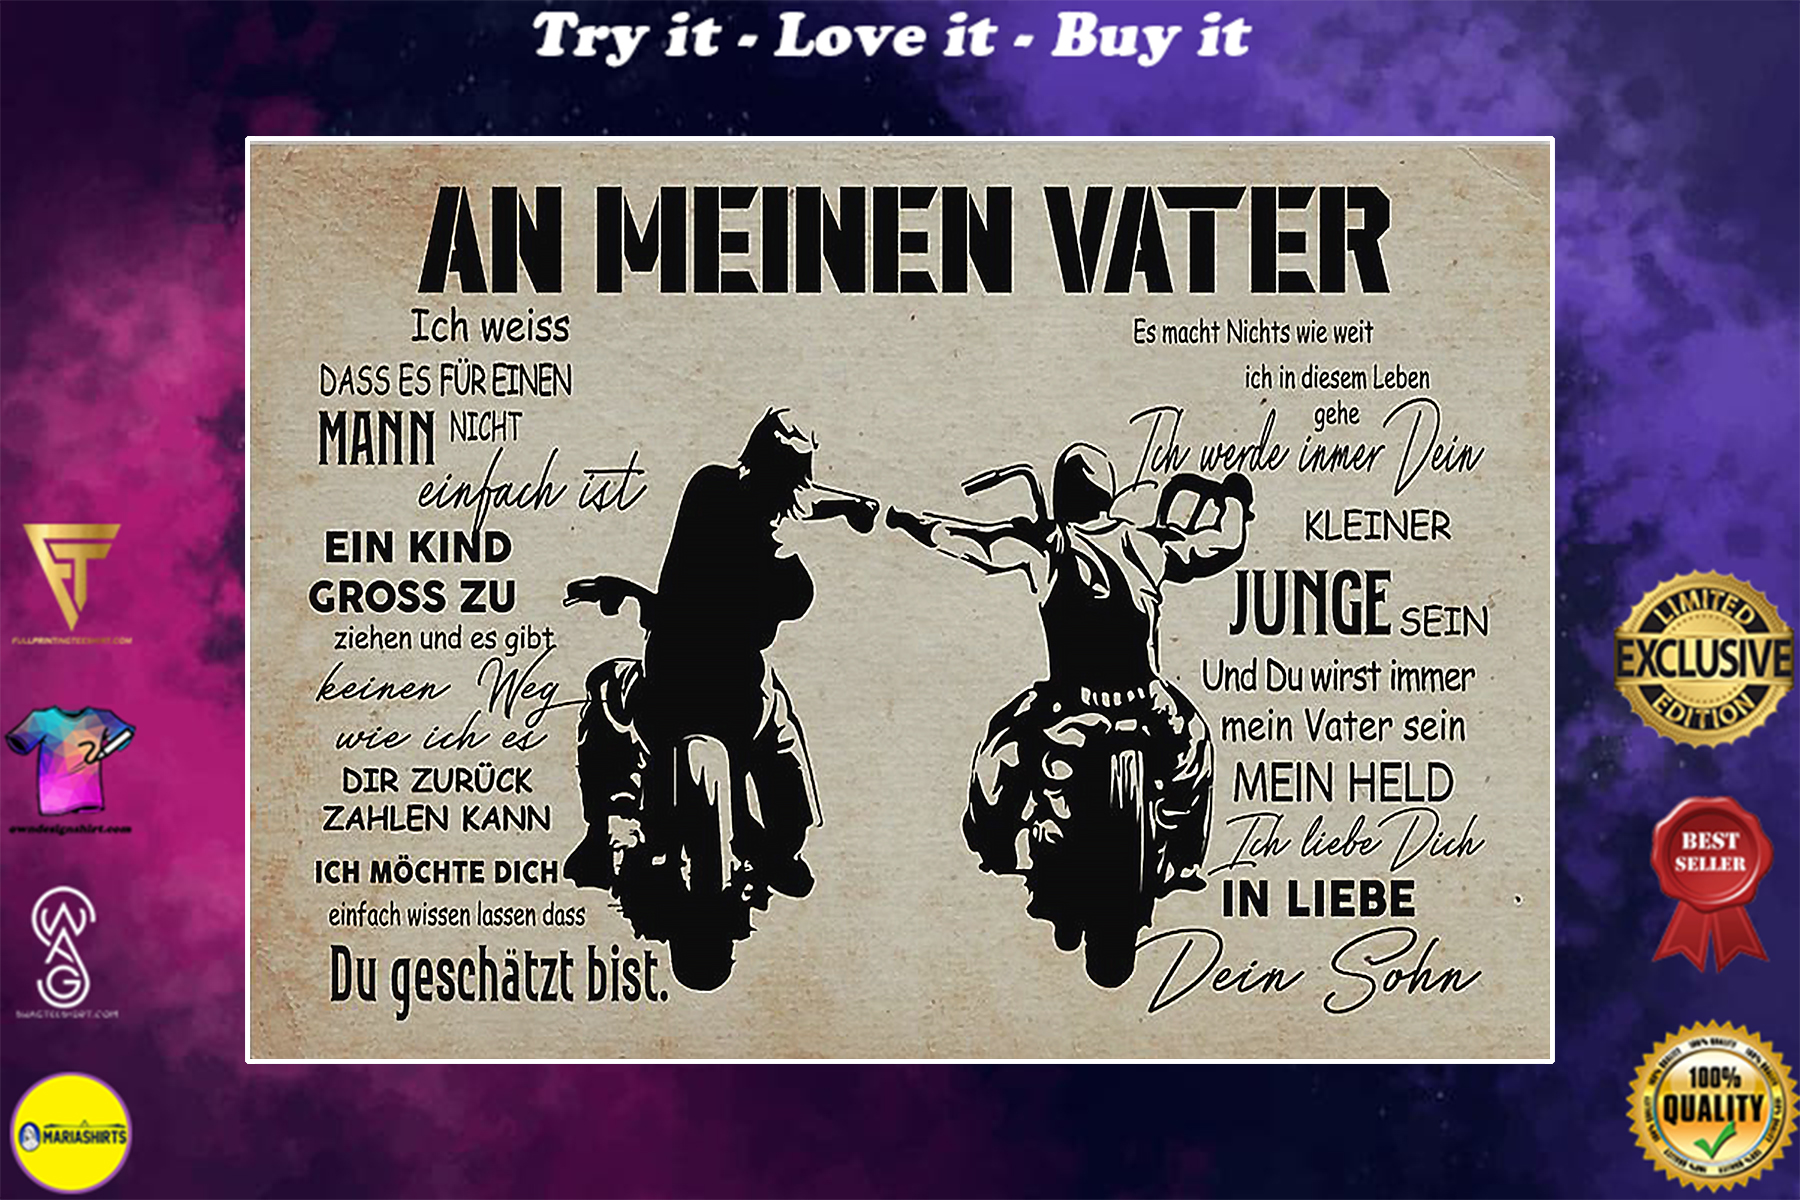 motorcycle an meinen vater dein sohn vintage poster